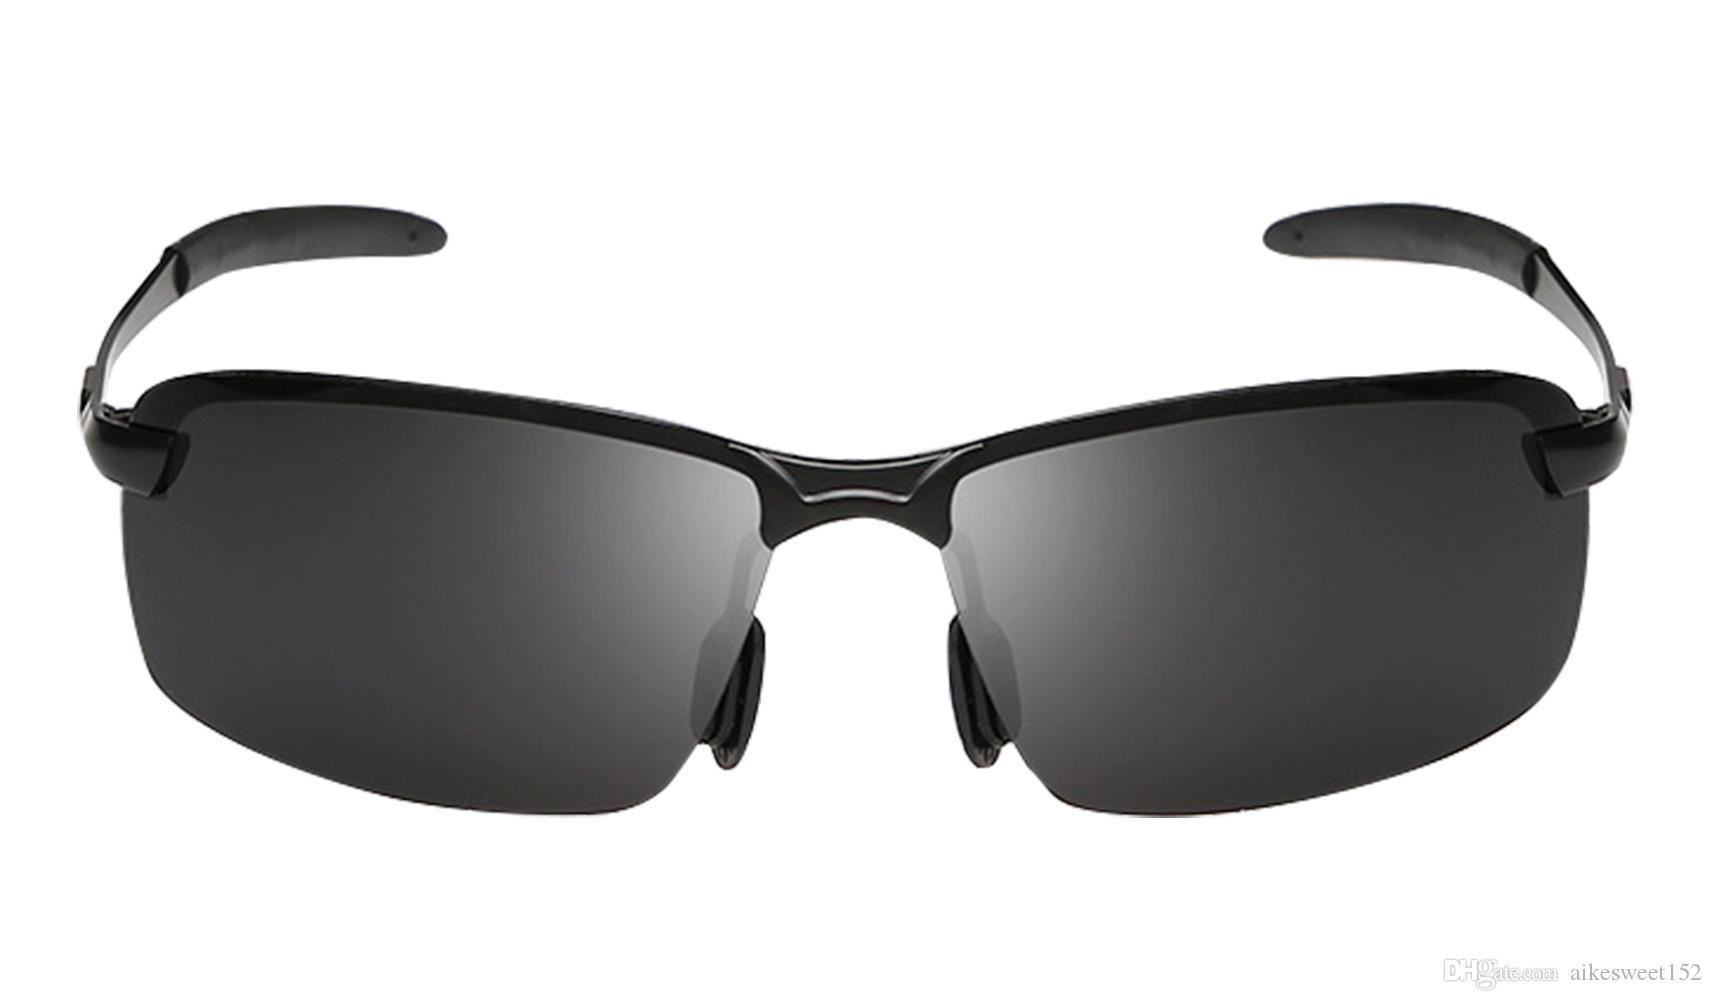 95bdfcc623b Cheap Men S Brand Polarized Sunglasses Best Brand Polarized Sunglasses  Cycling